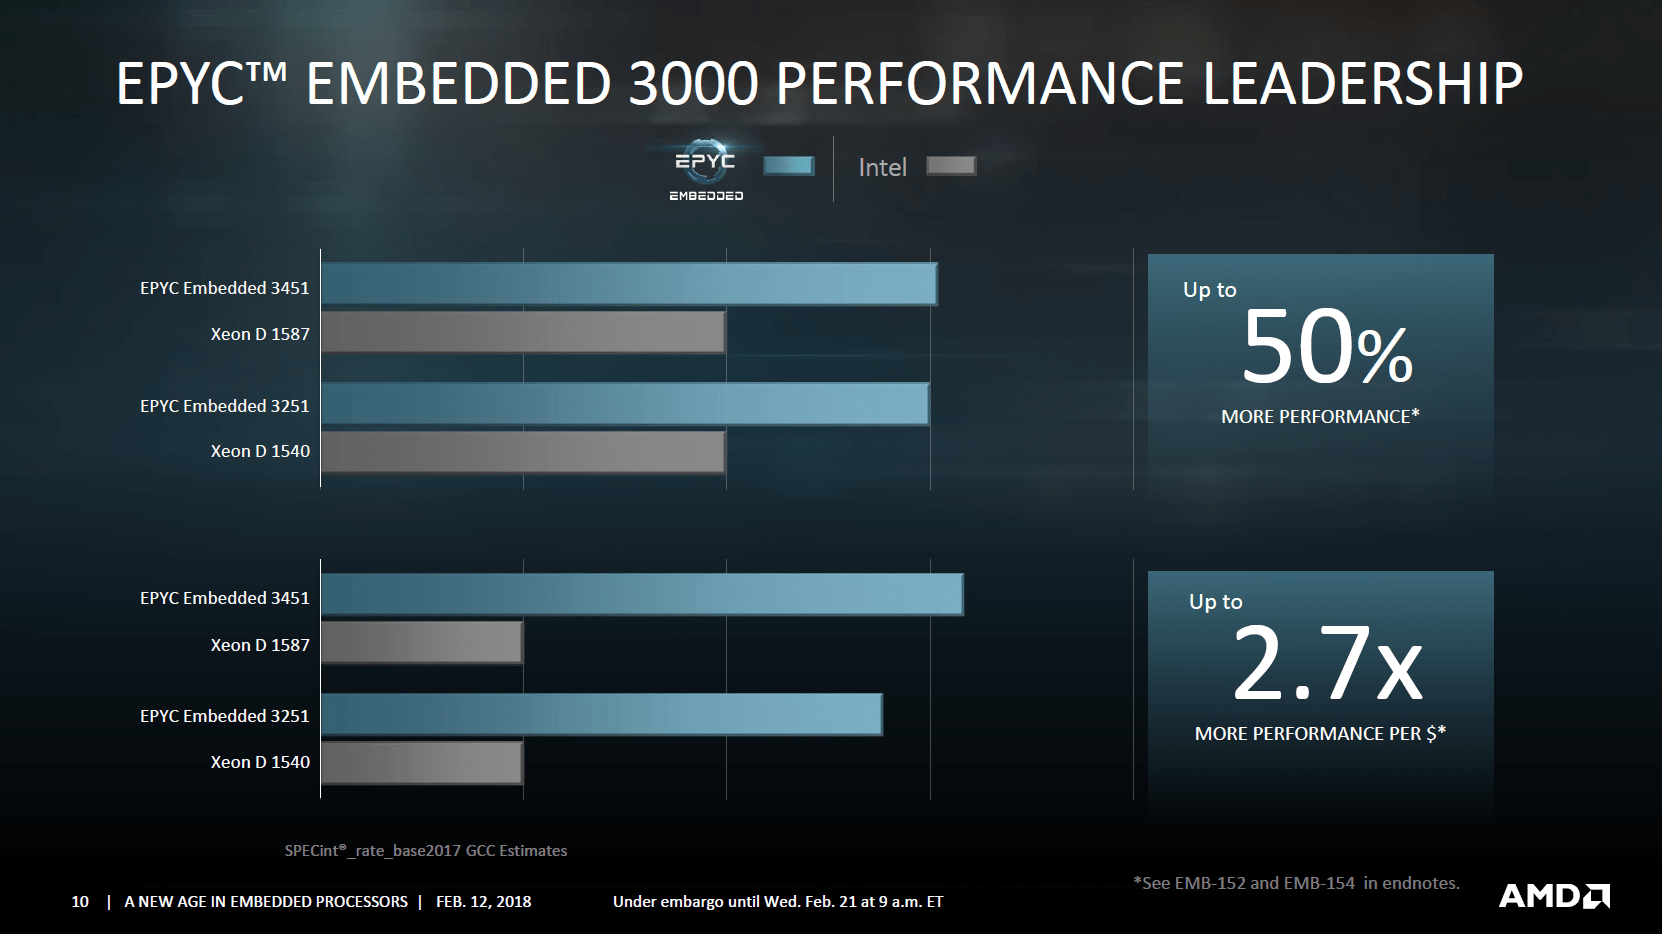 AMD Epyc Embedded 3000 gegen Intel Xeon D